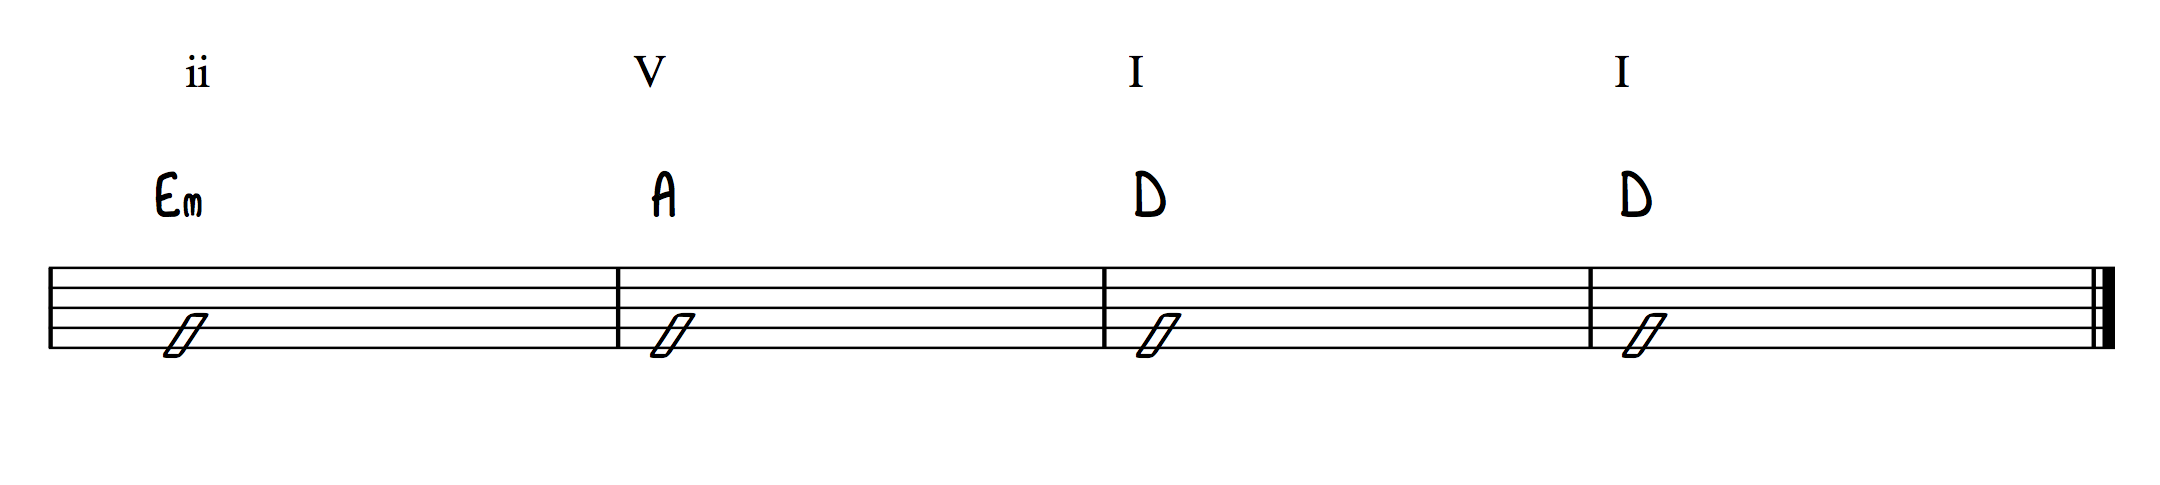 Chord Progression 2 5 1 D